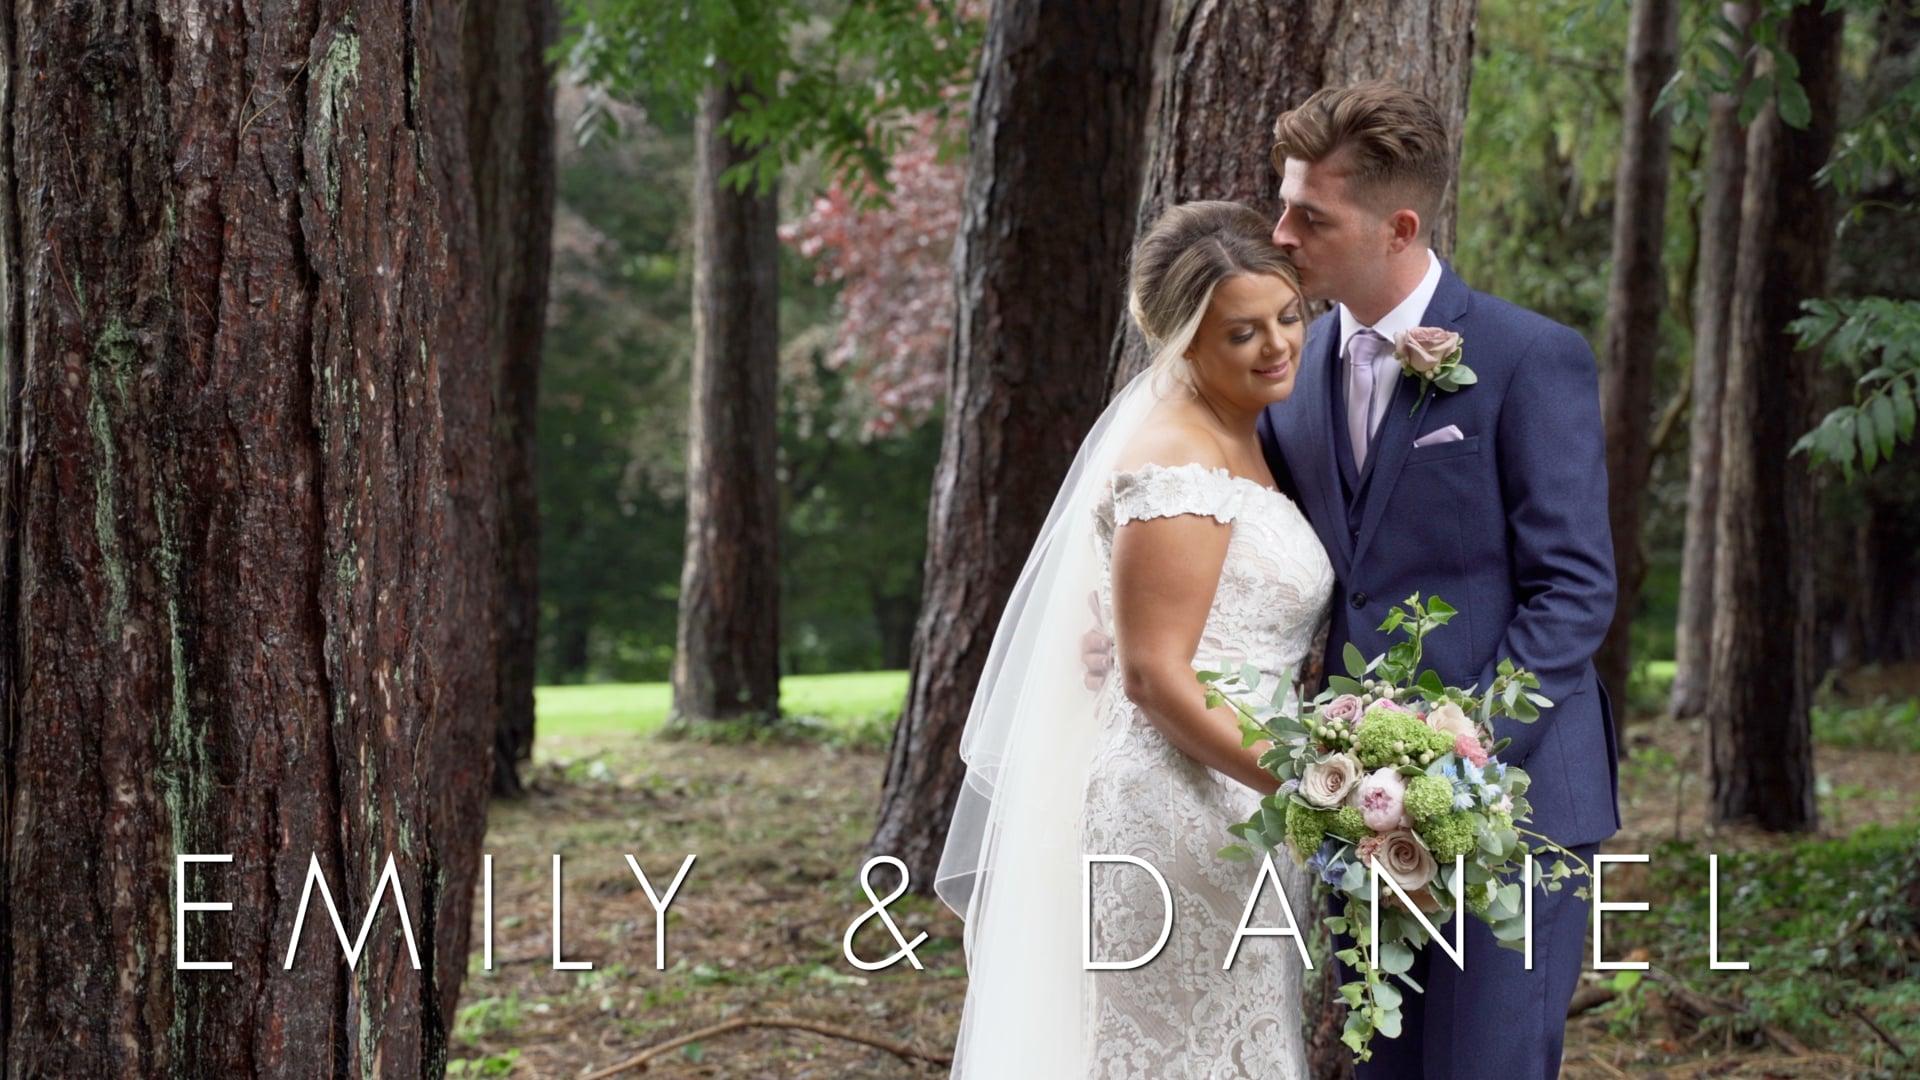 Emily & Daniel's Wedding Film | Abbey House - Barrow-in-Furness